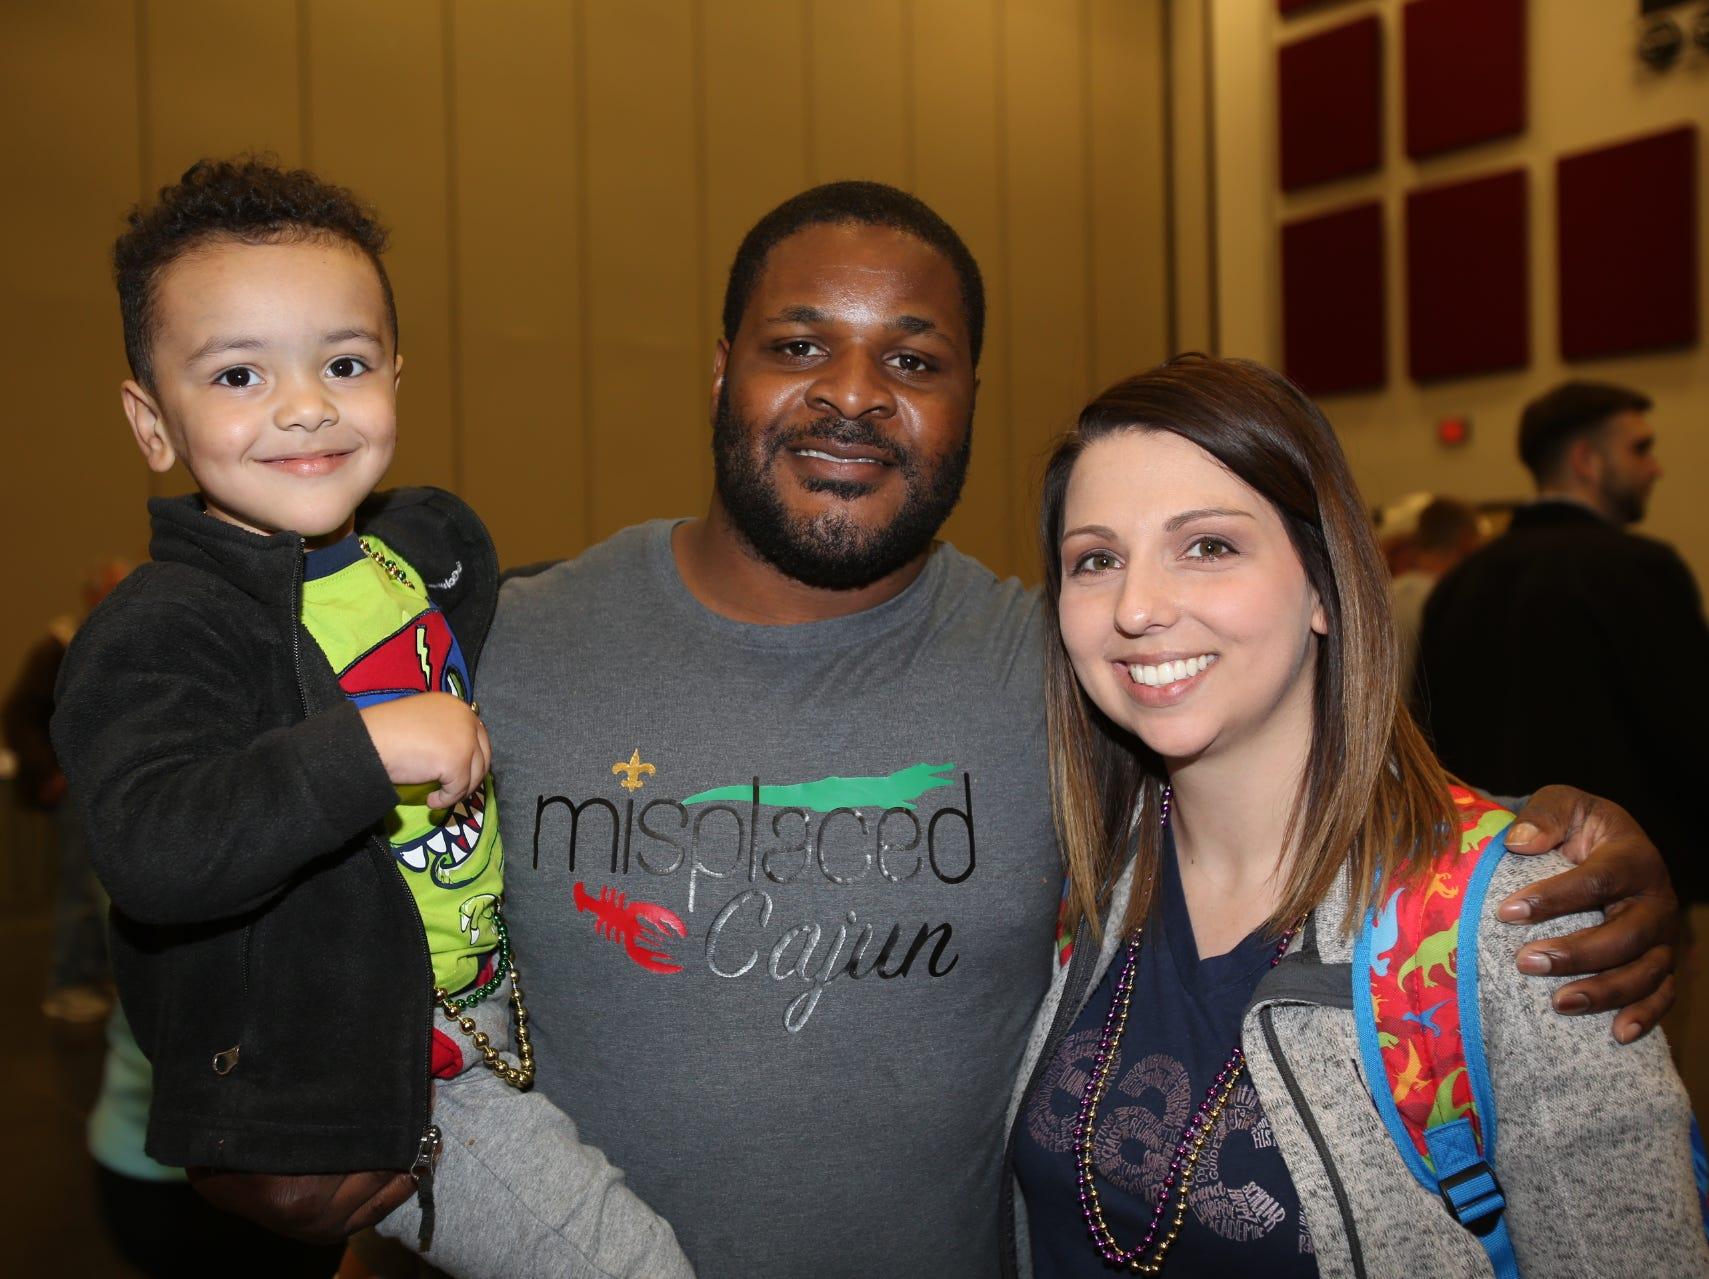 Caden, Casey, and Jordan Henderson